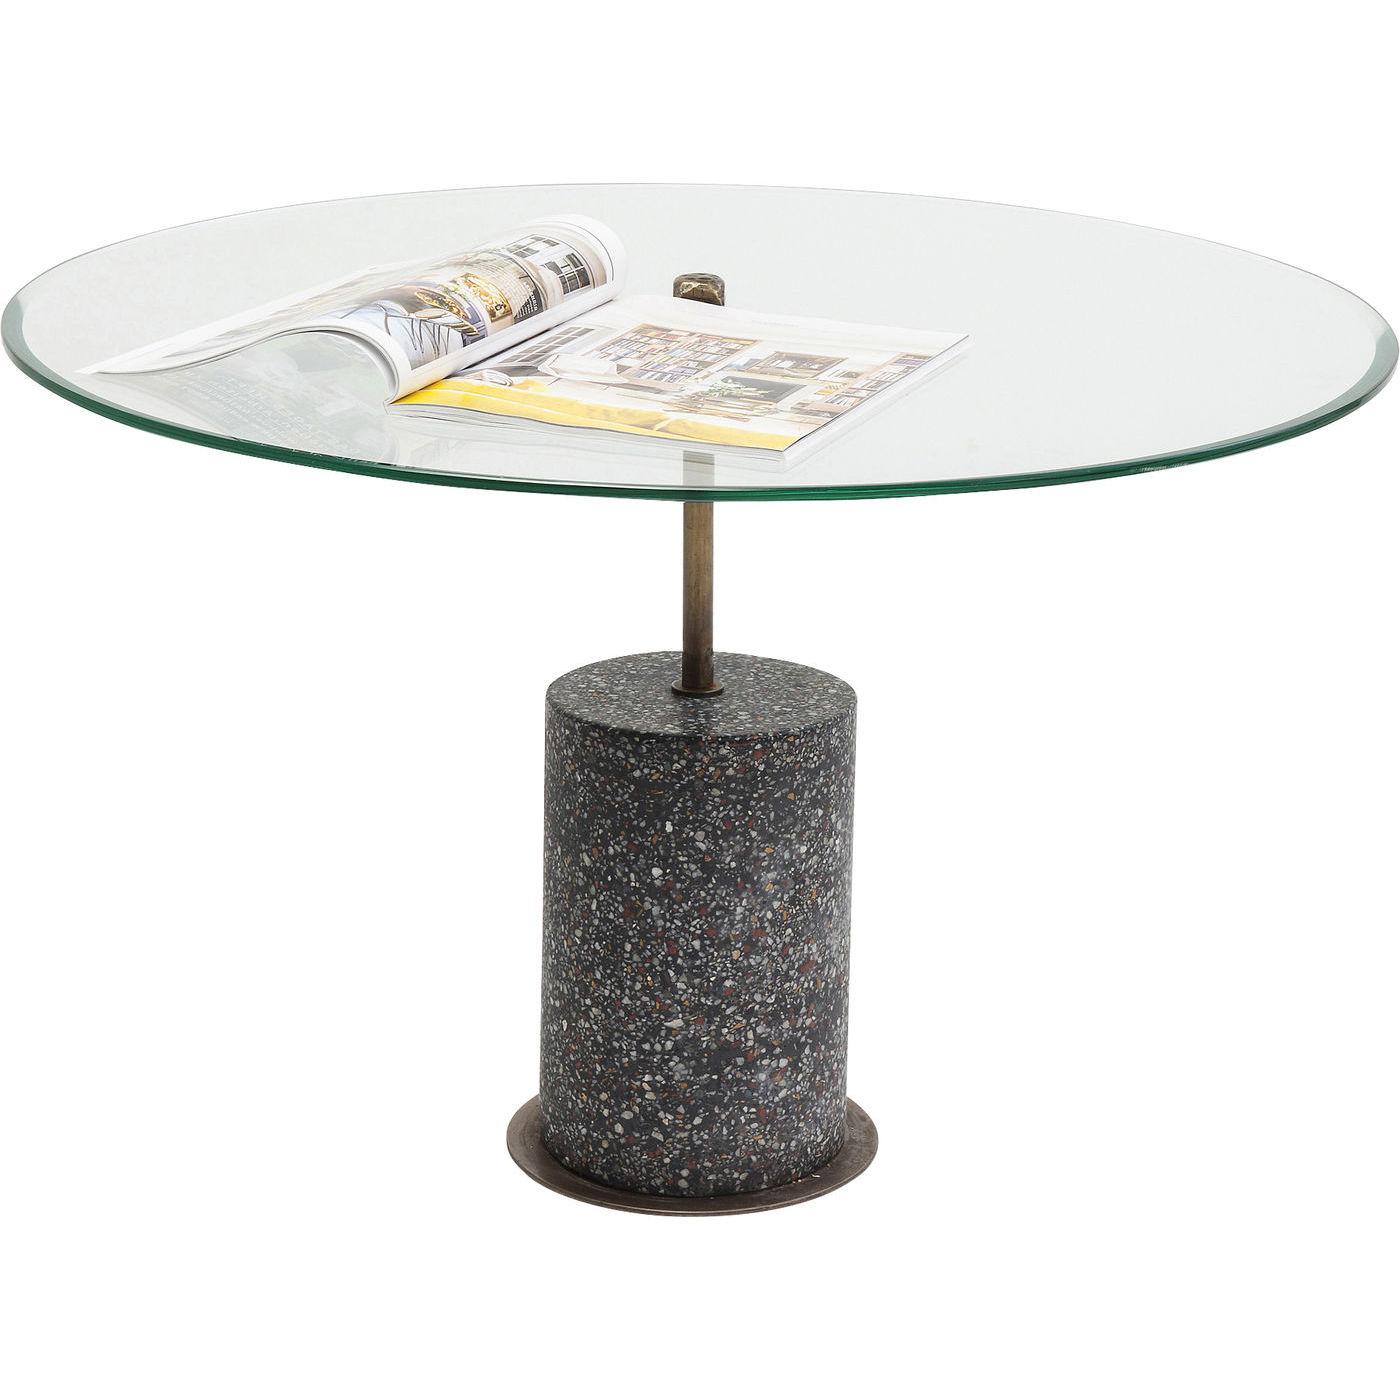 Kare design terrazzo visible black sofabord - klart glas/sort terrazzo beton, rundt (ø81) fra kare design på boboonline.dk